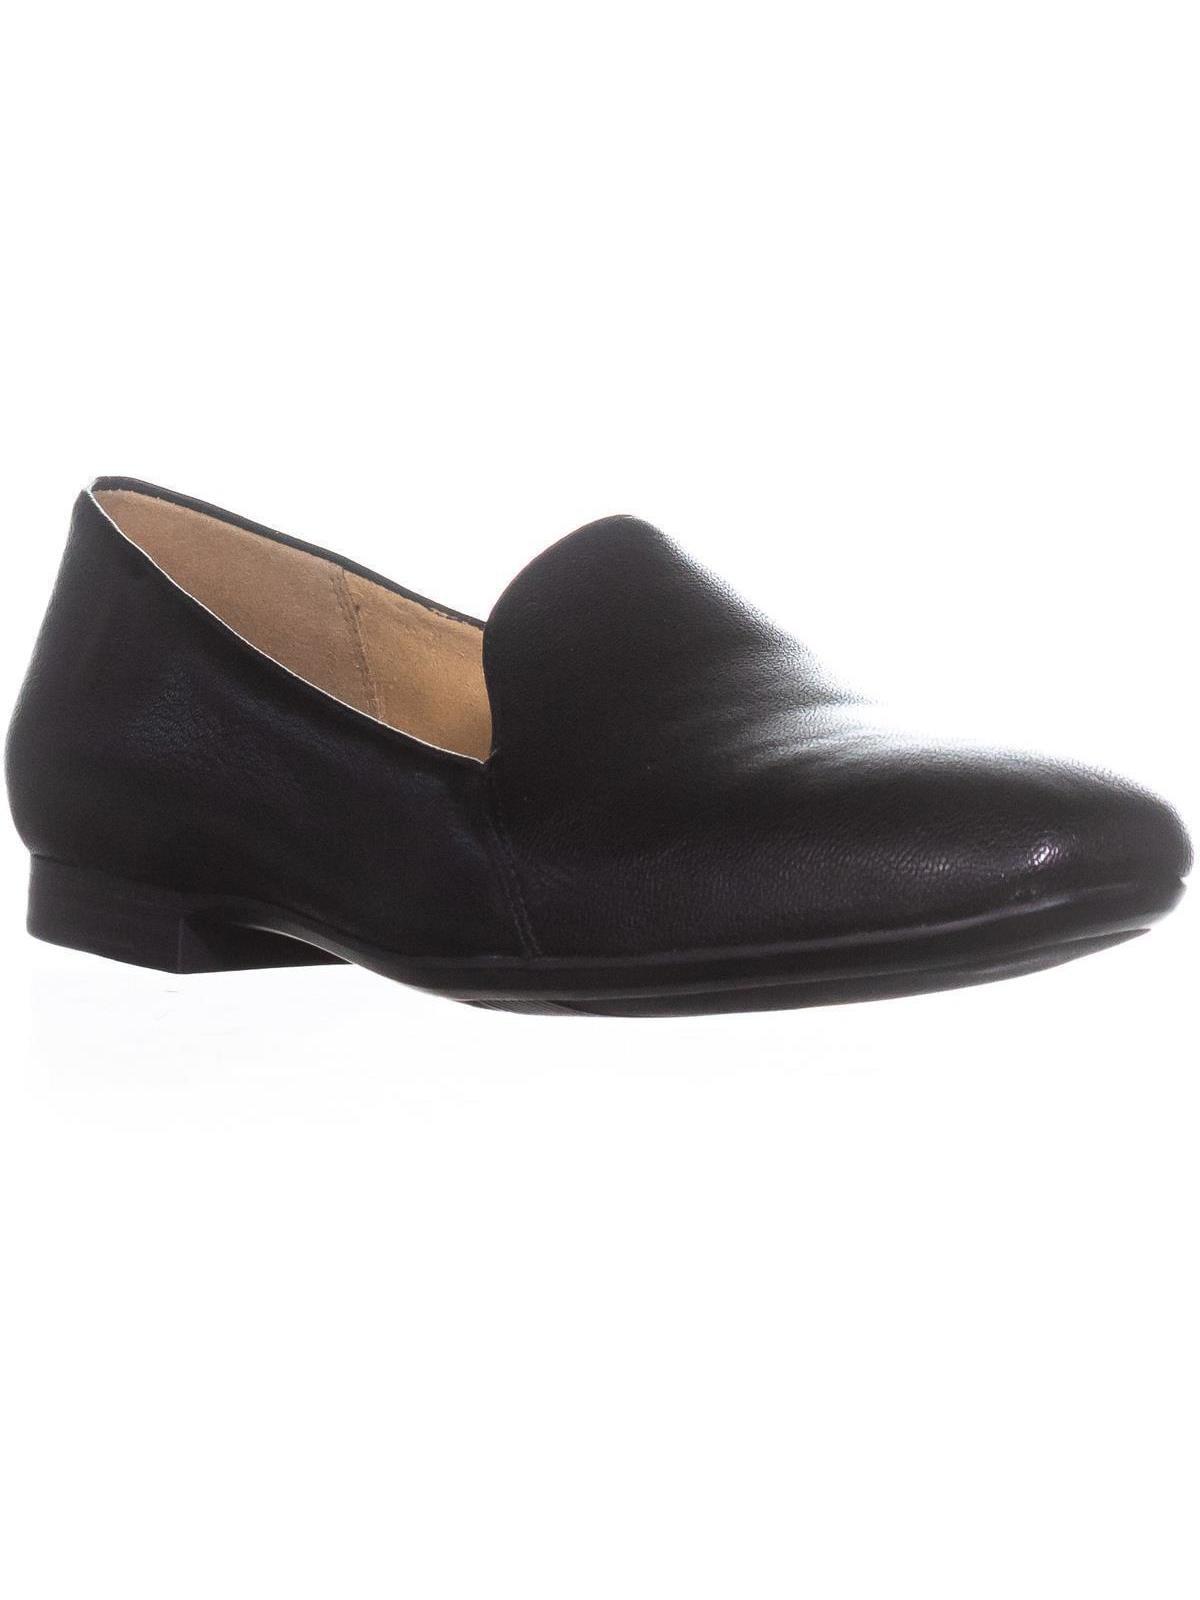 Naturalizer Women's emiline Slip-On Loafer Economical, stylish, and eye-catching shoes